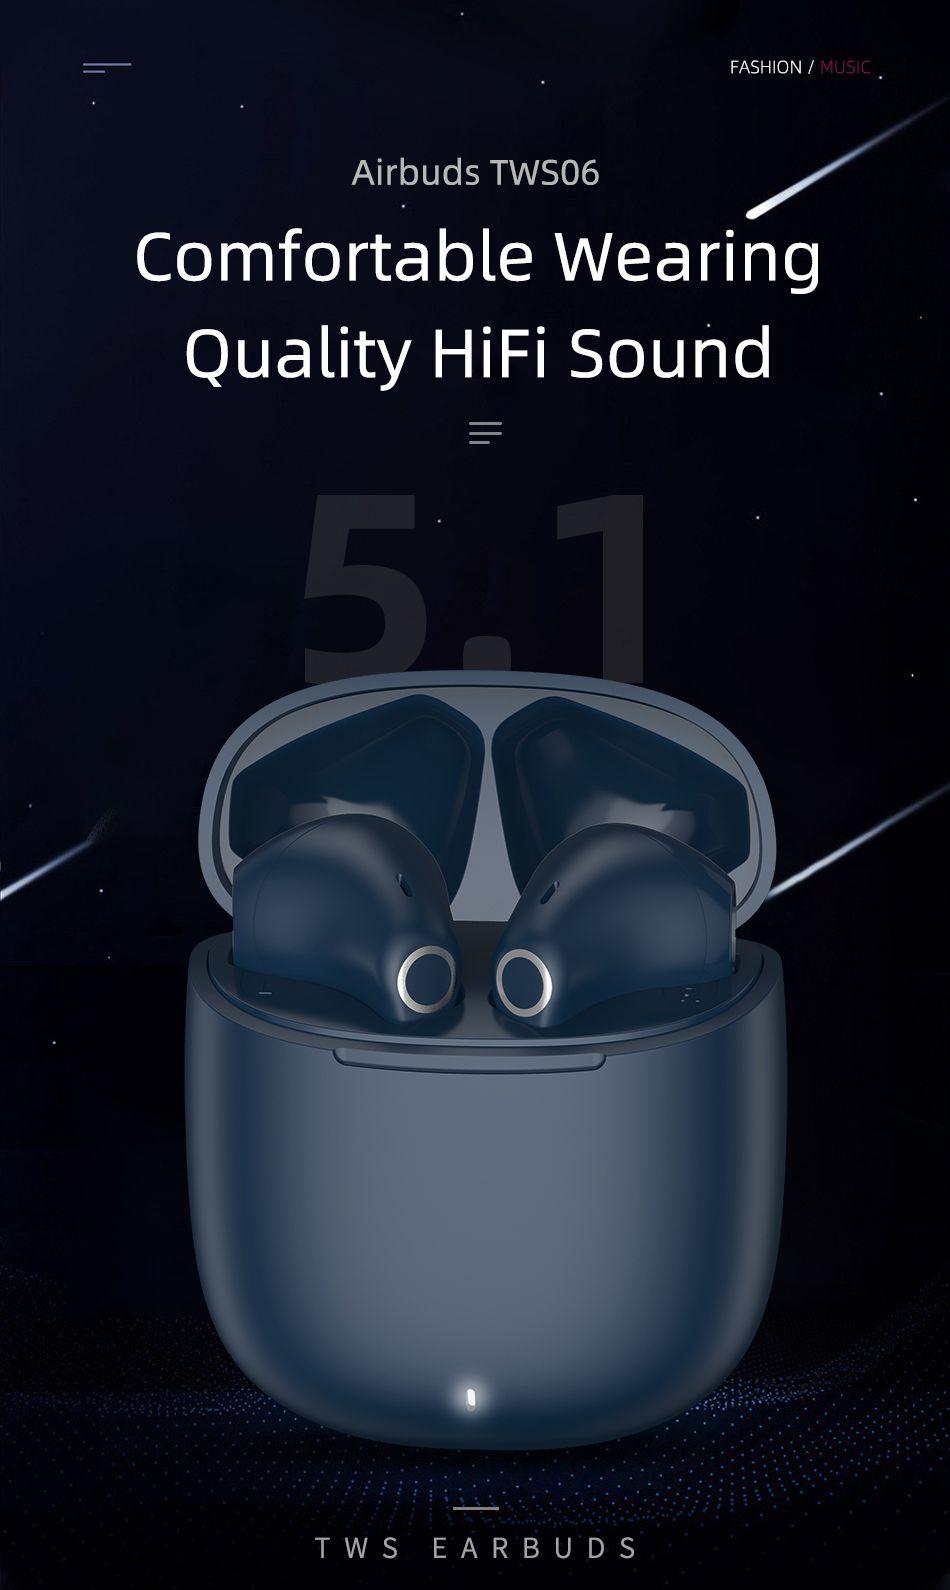 Wiwu Airbuds Tws06 Bluetooth Stereo Earbuds (2)